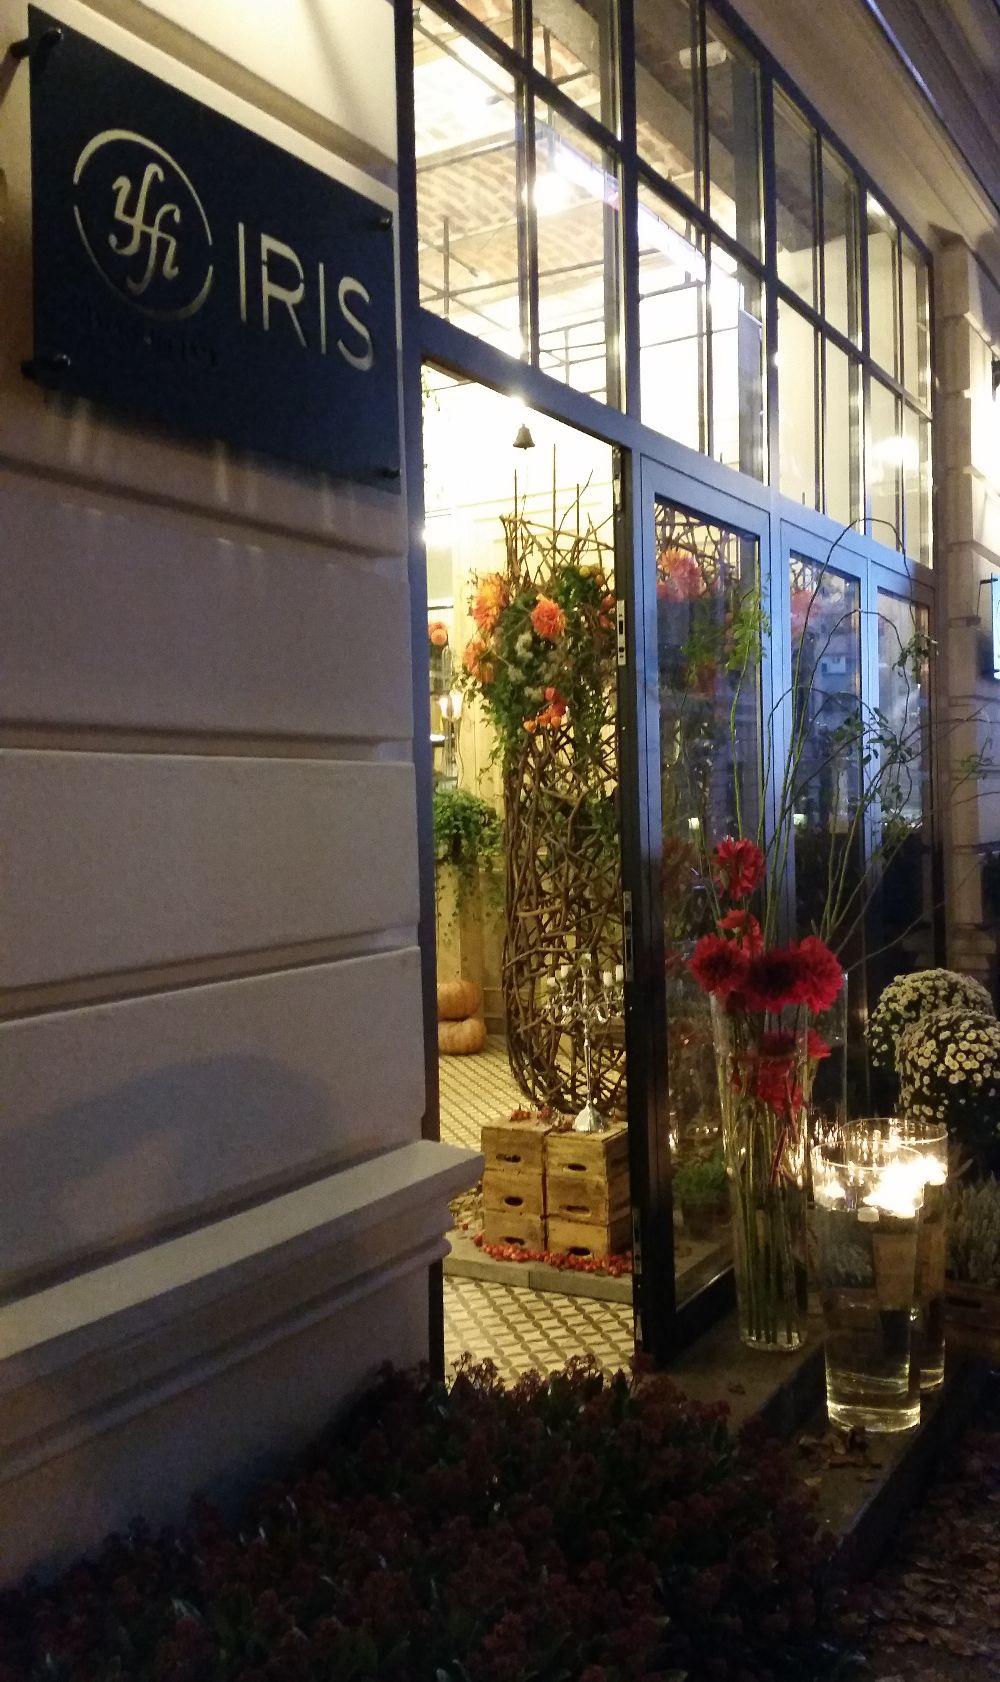 adelaparvu.com despre 45 de ani aniversare Floraria Iris, design floral Nicu Bocancea (44)